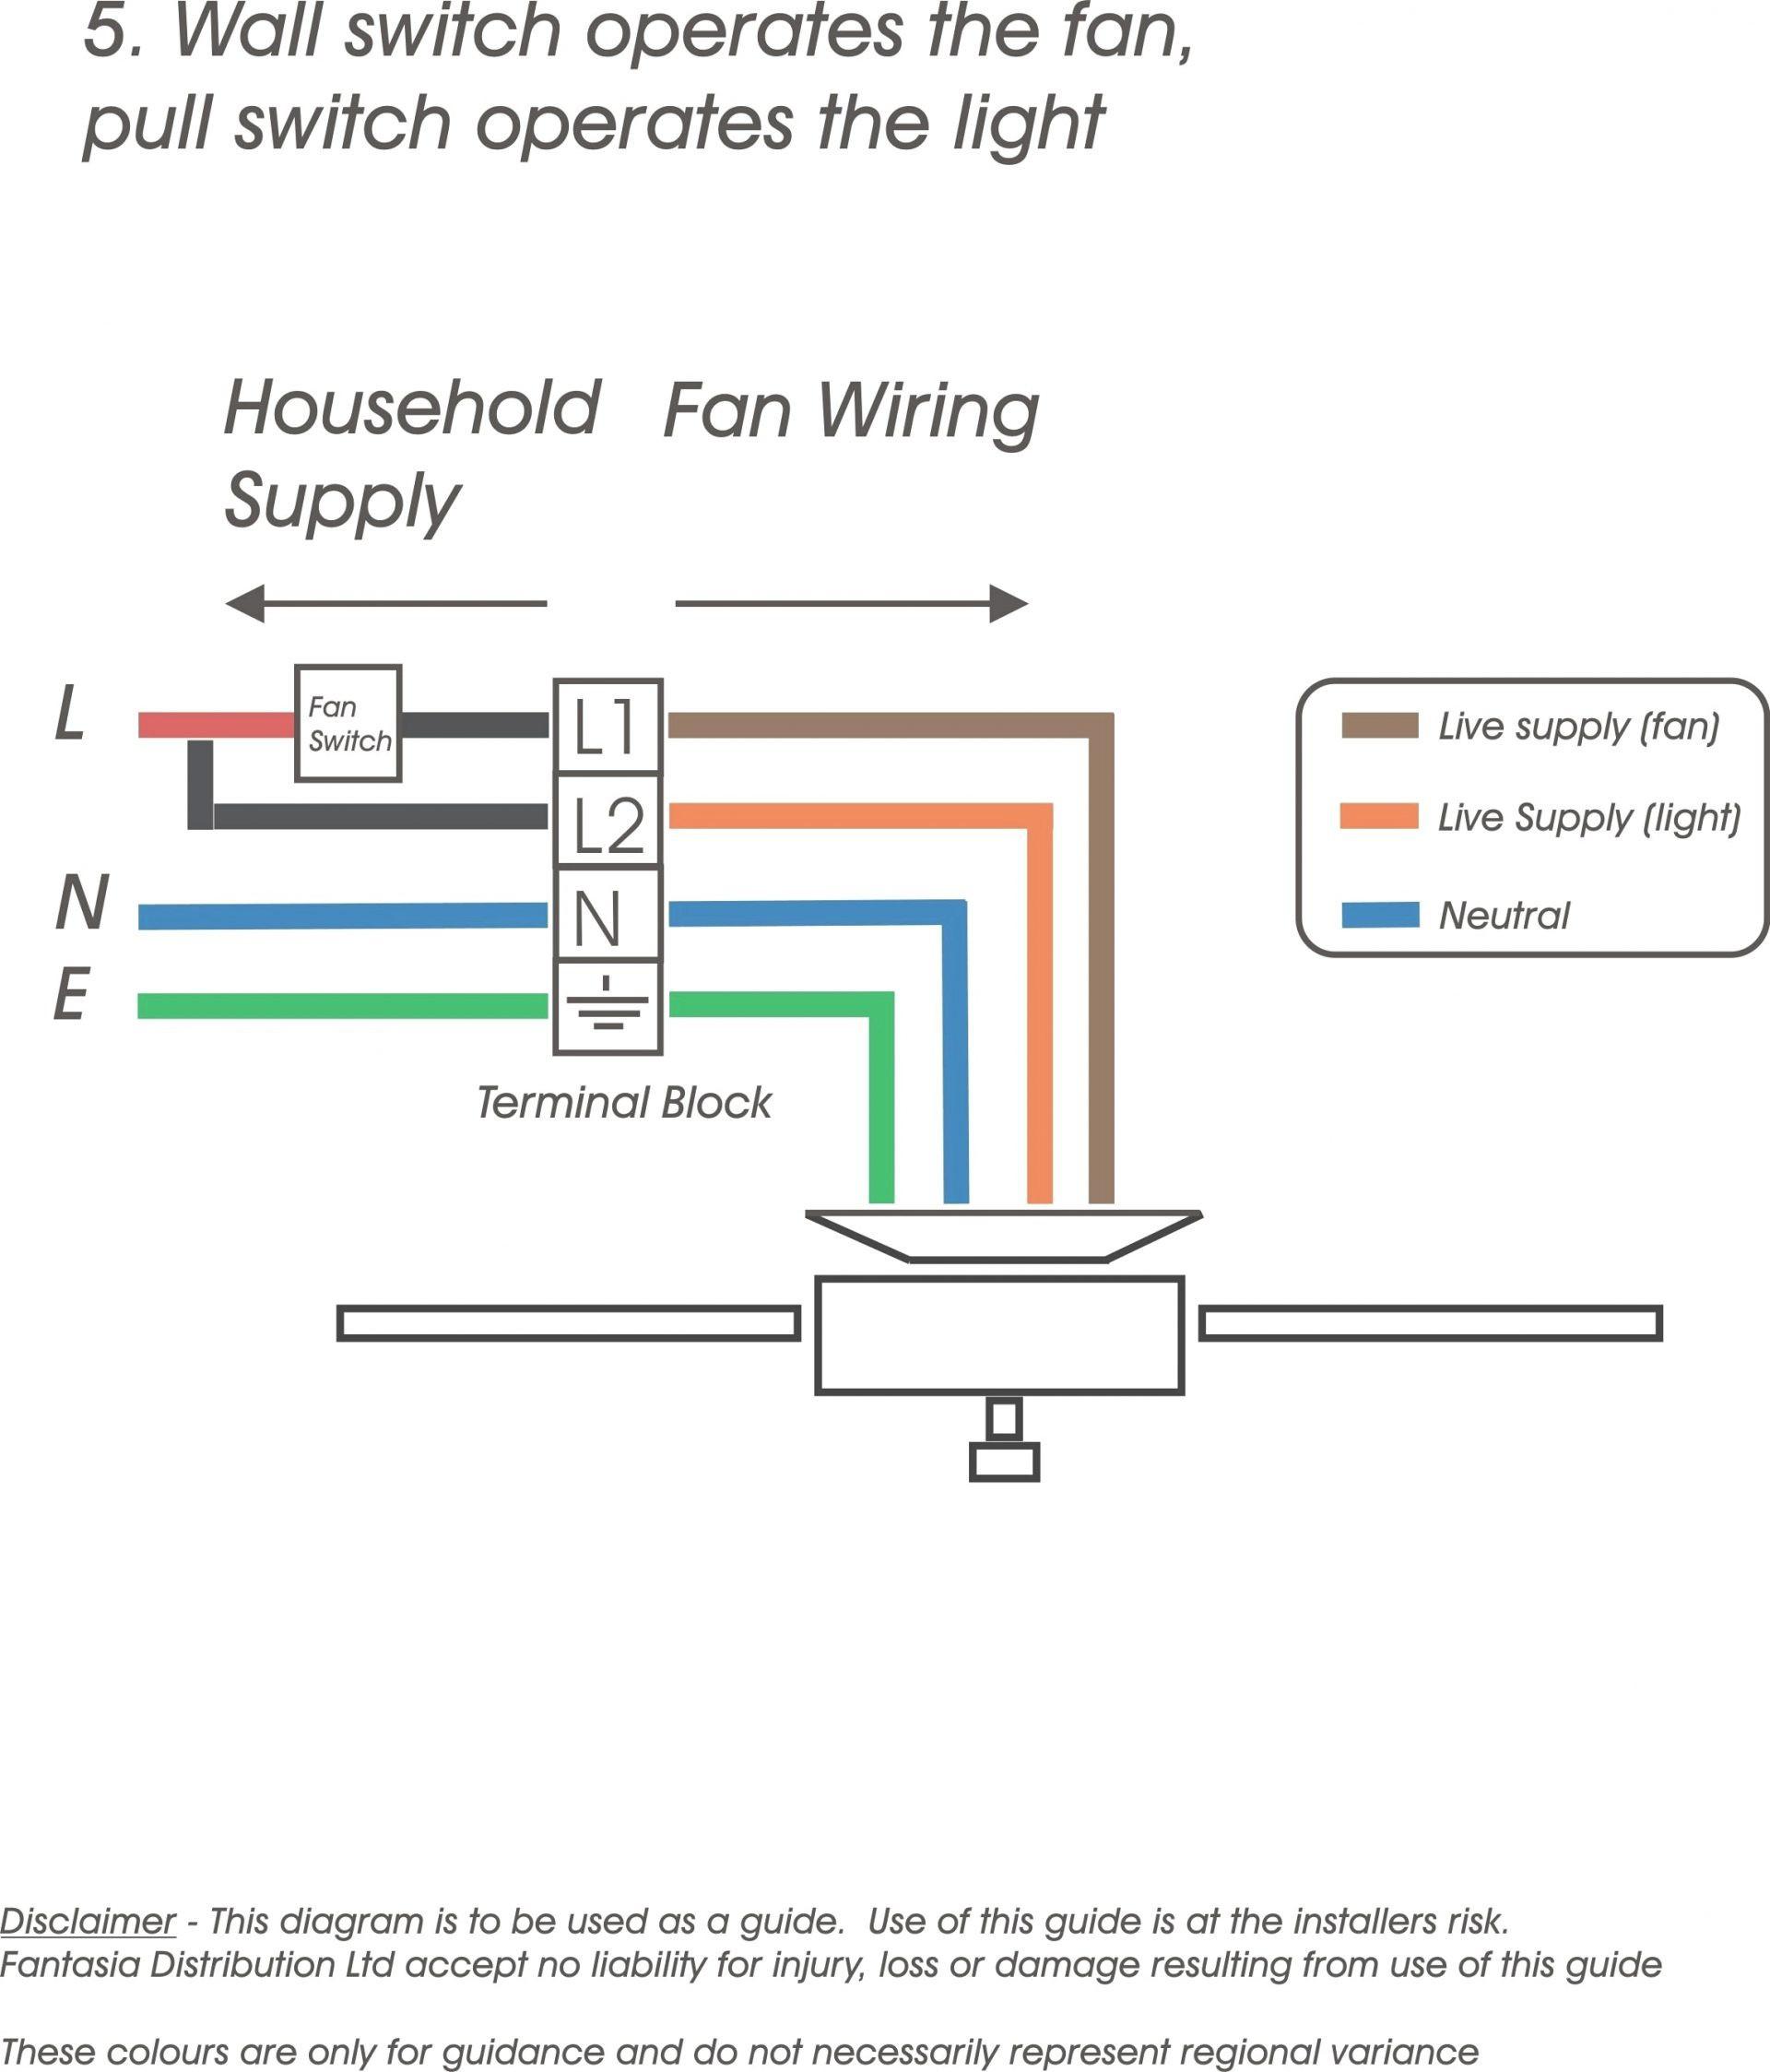 Gl450 Power Window Switch Wiring Diagram | Manual E-Books - Power Window Switch Wiring Diagram